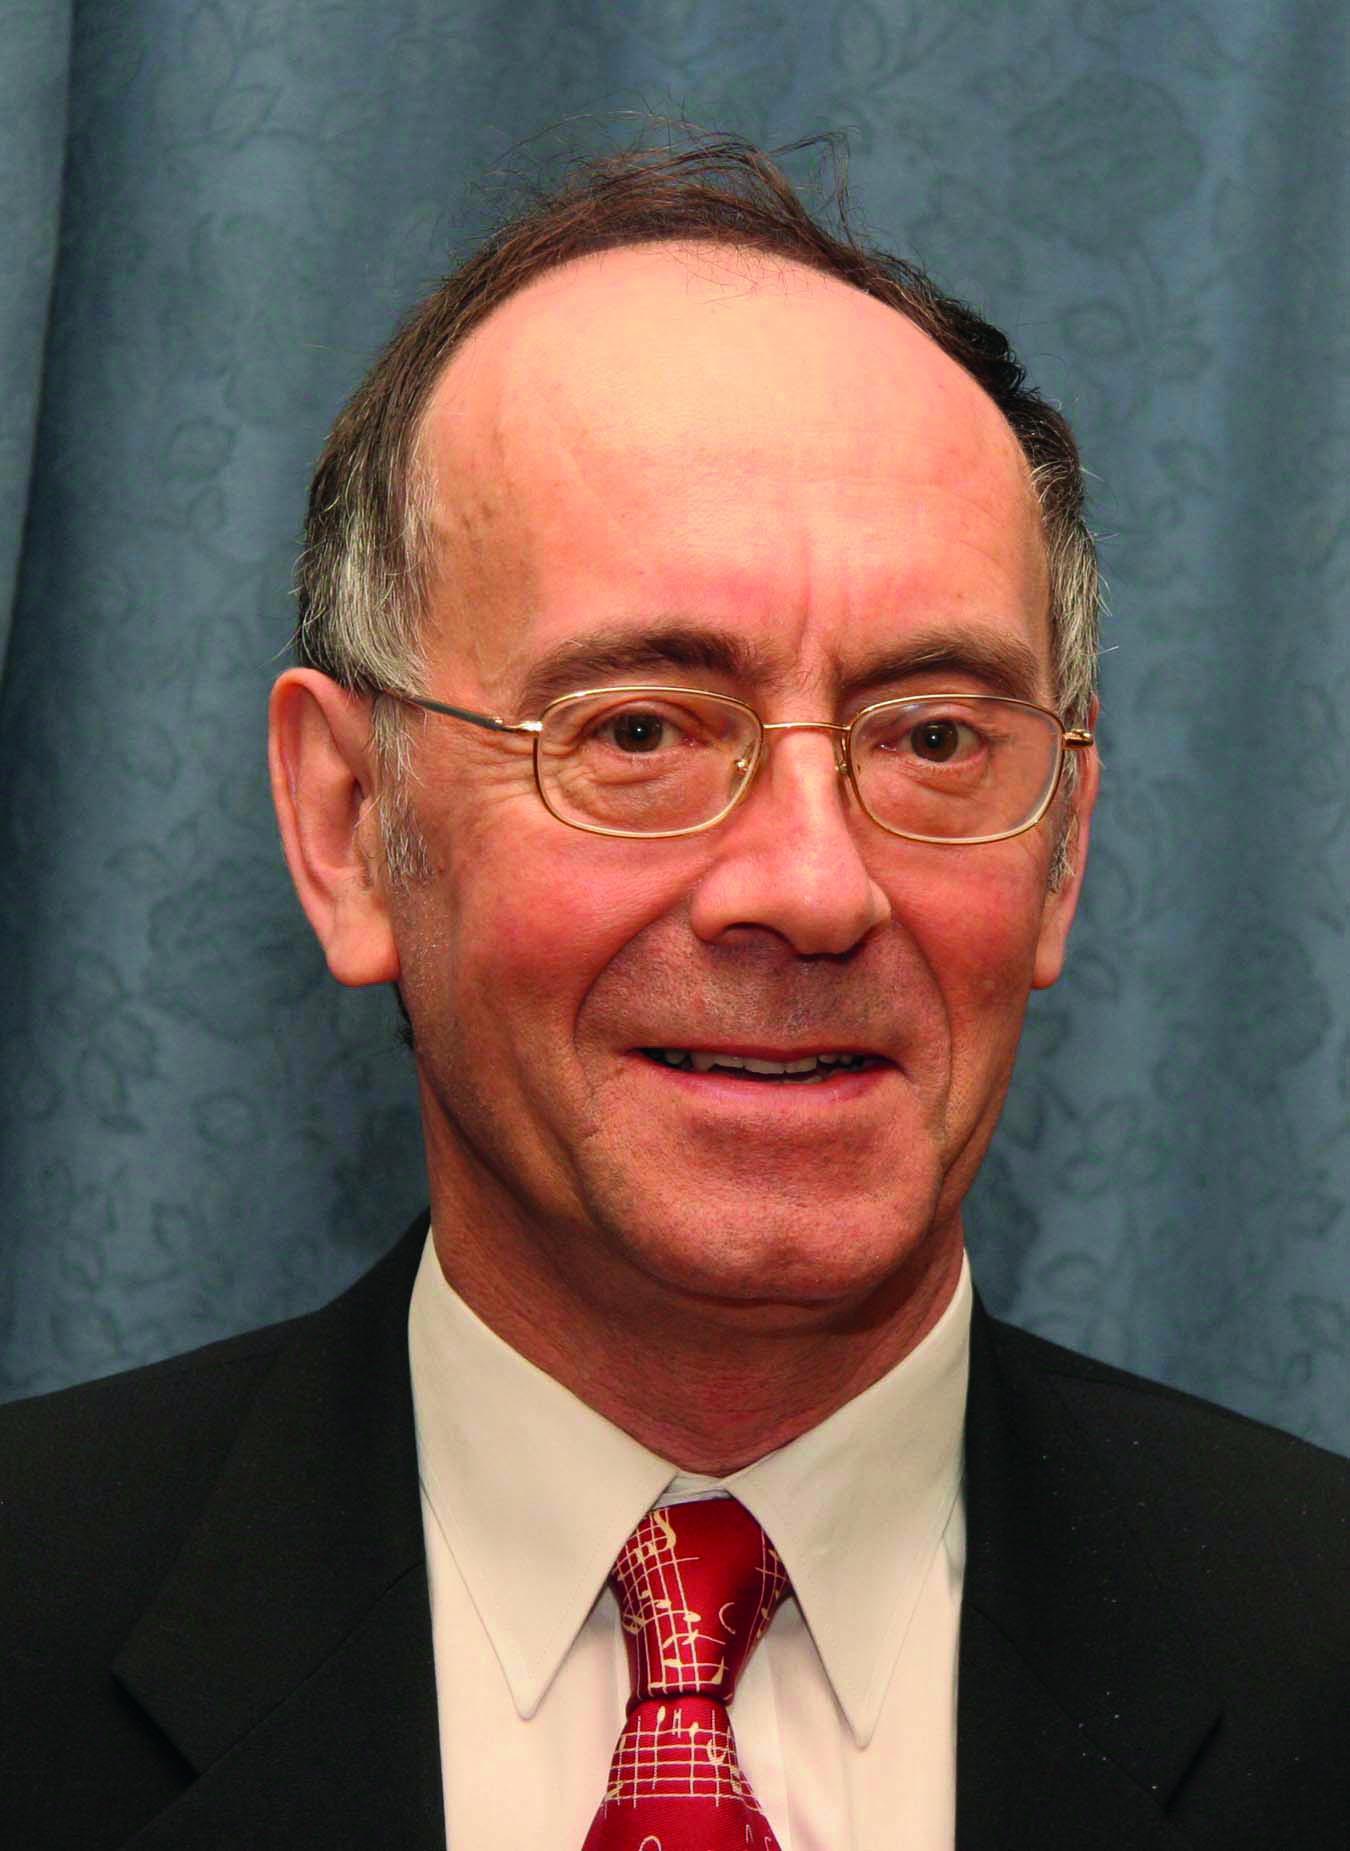 David Victor-Smith MBE